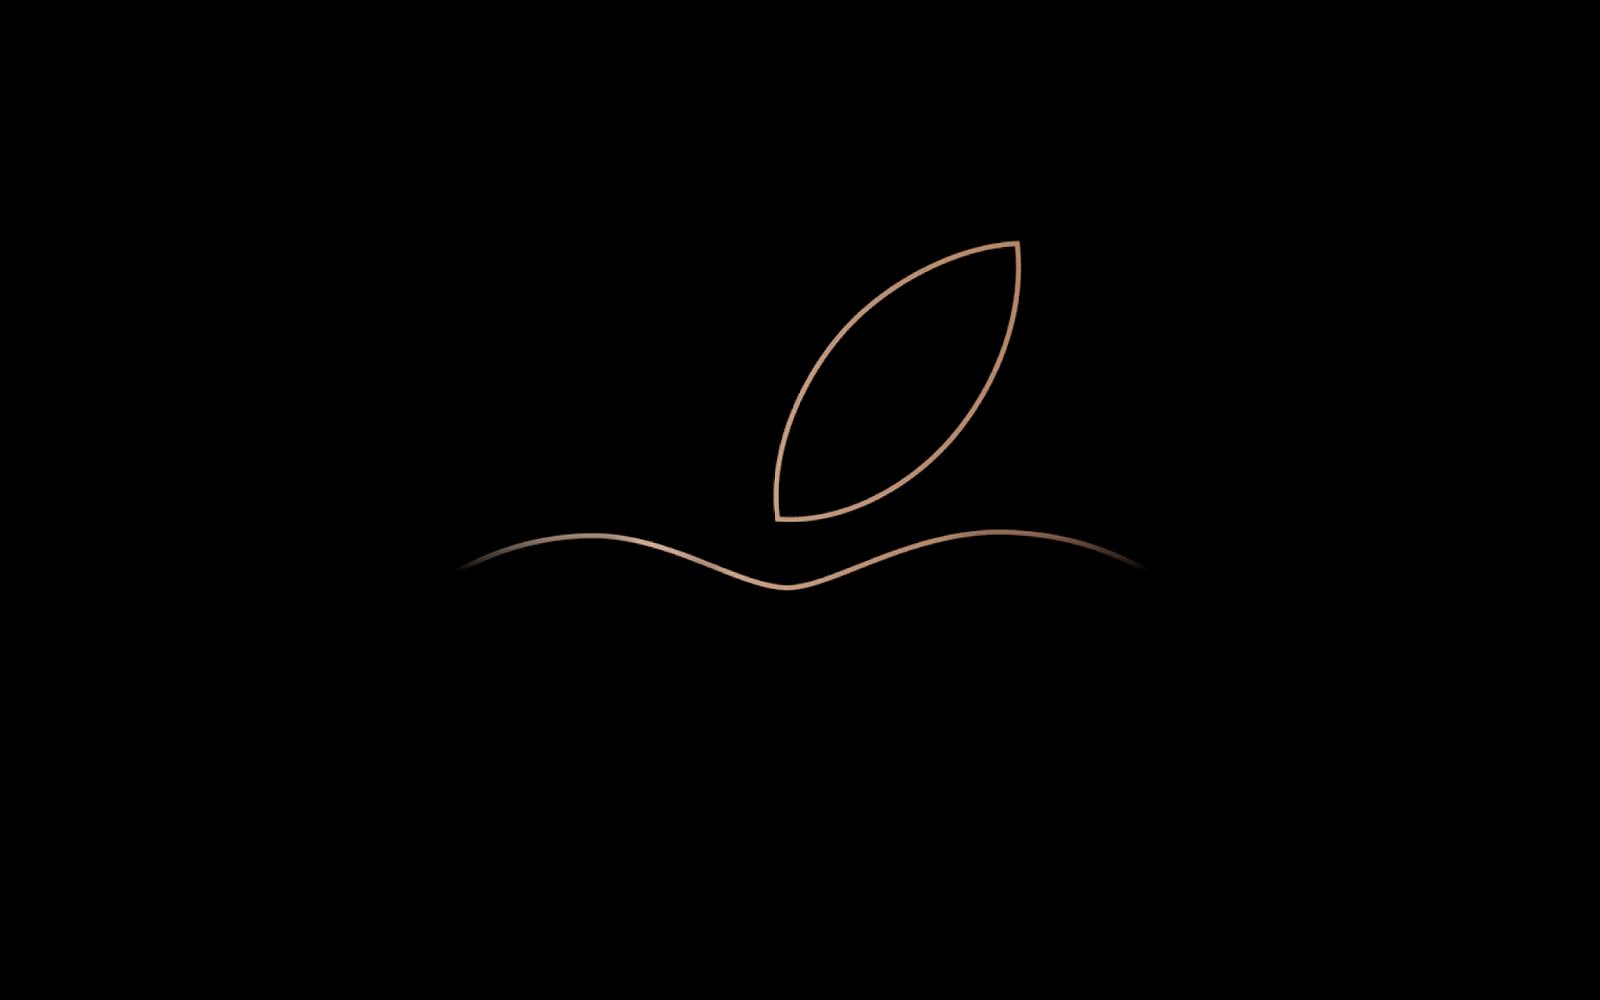 Apple, Logo, Minimal, Dark Background, HD, Technology